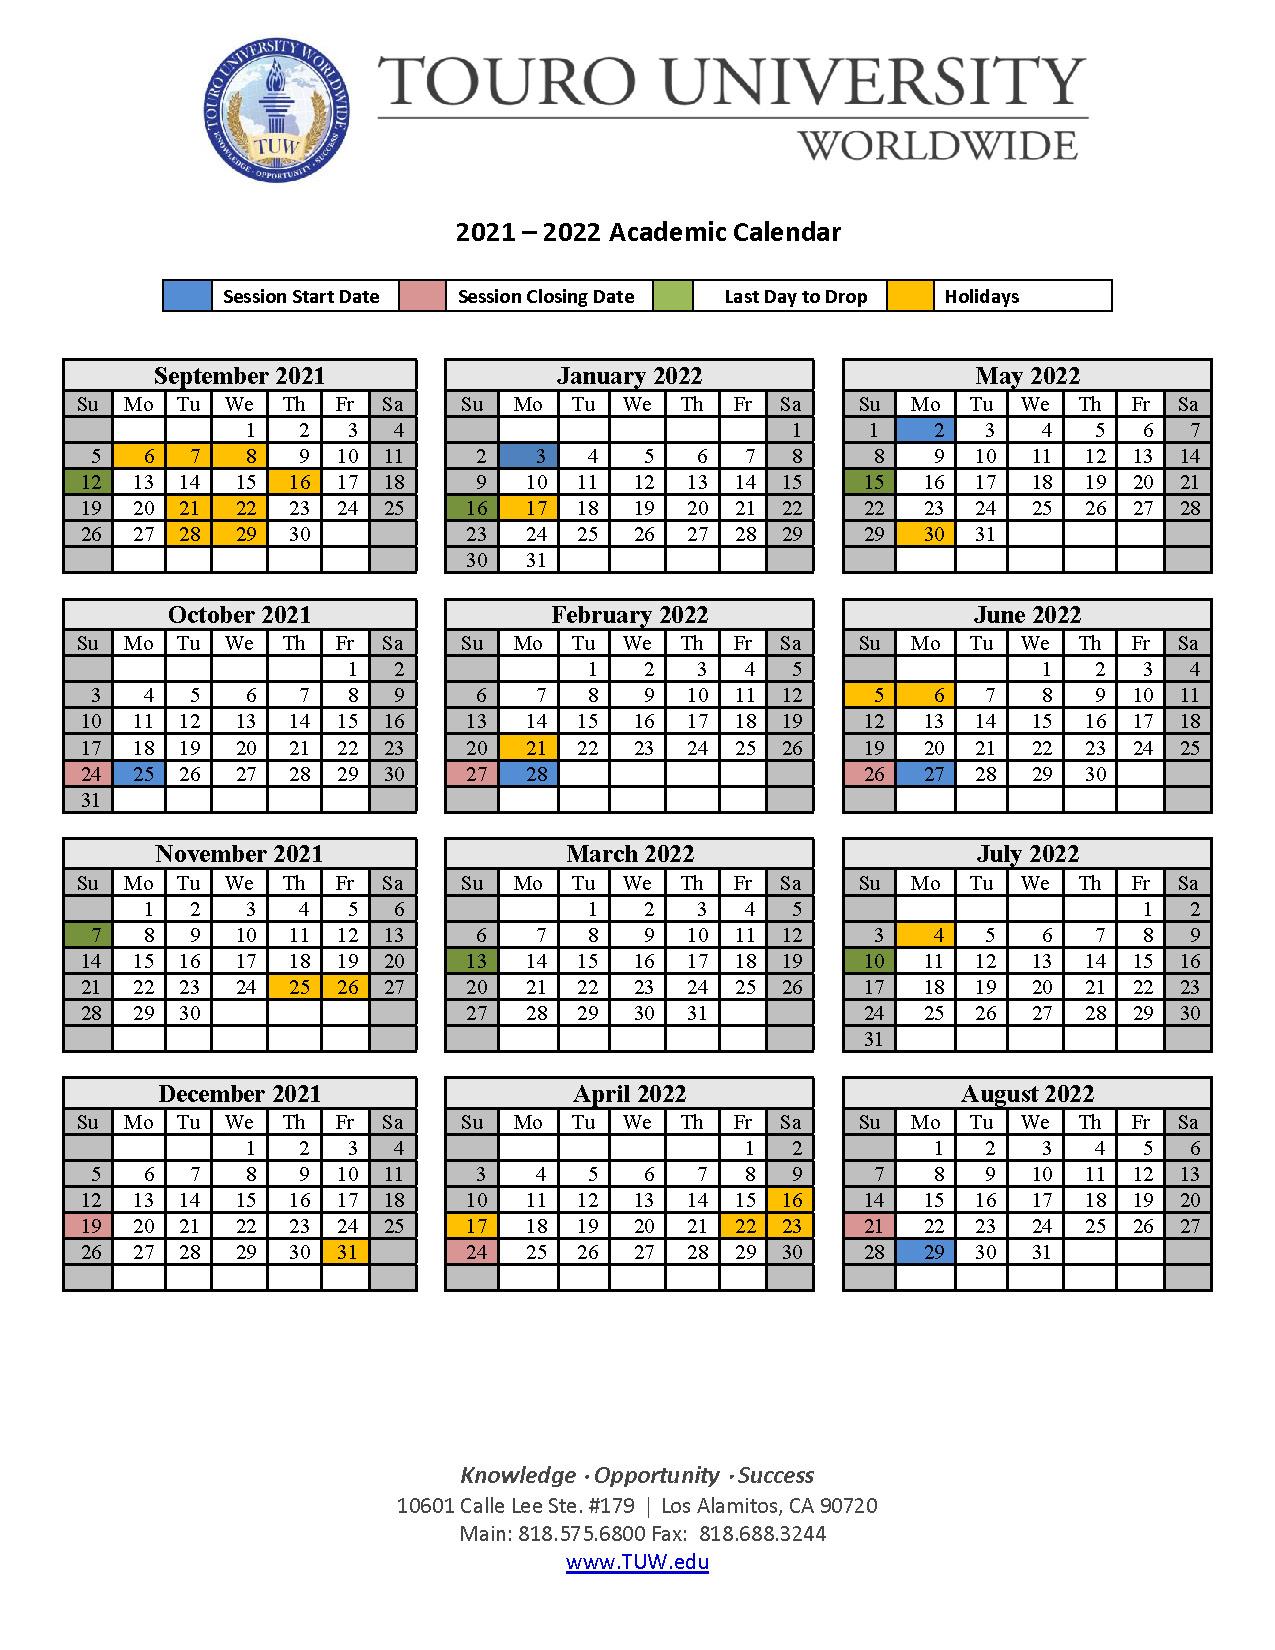 Twu Academic Calendar 2021 Academic Calendar | Touro University Worldwide